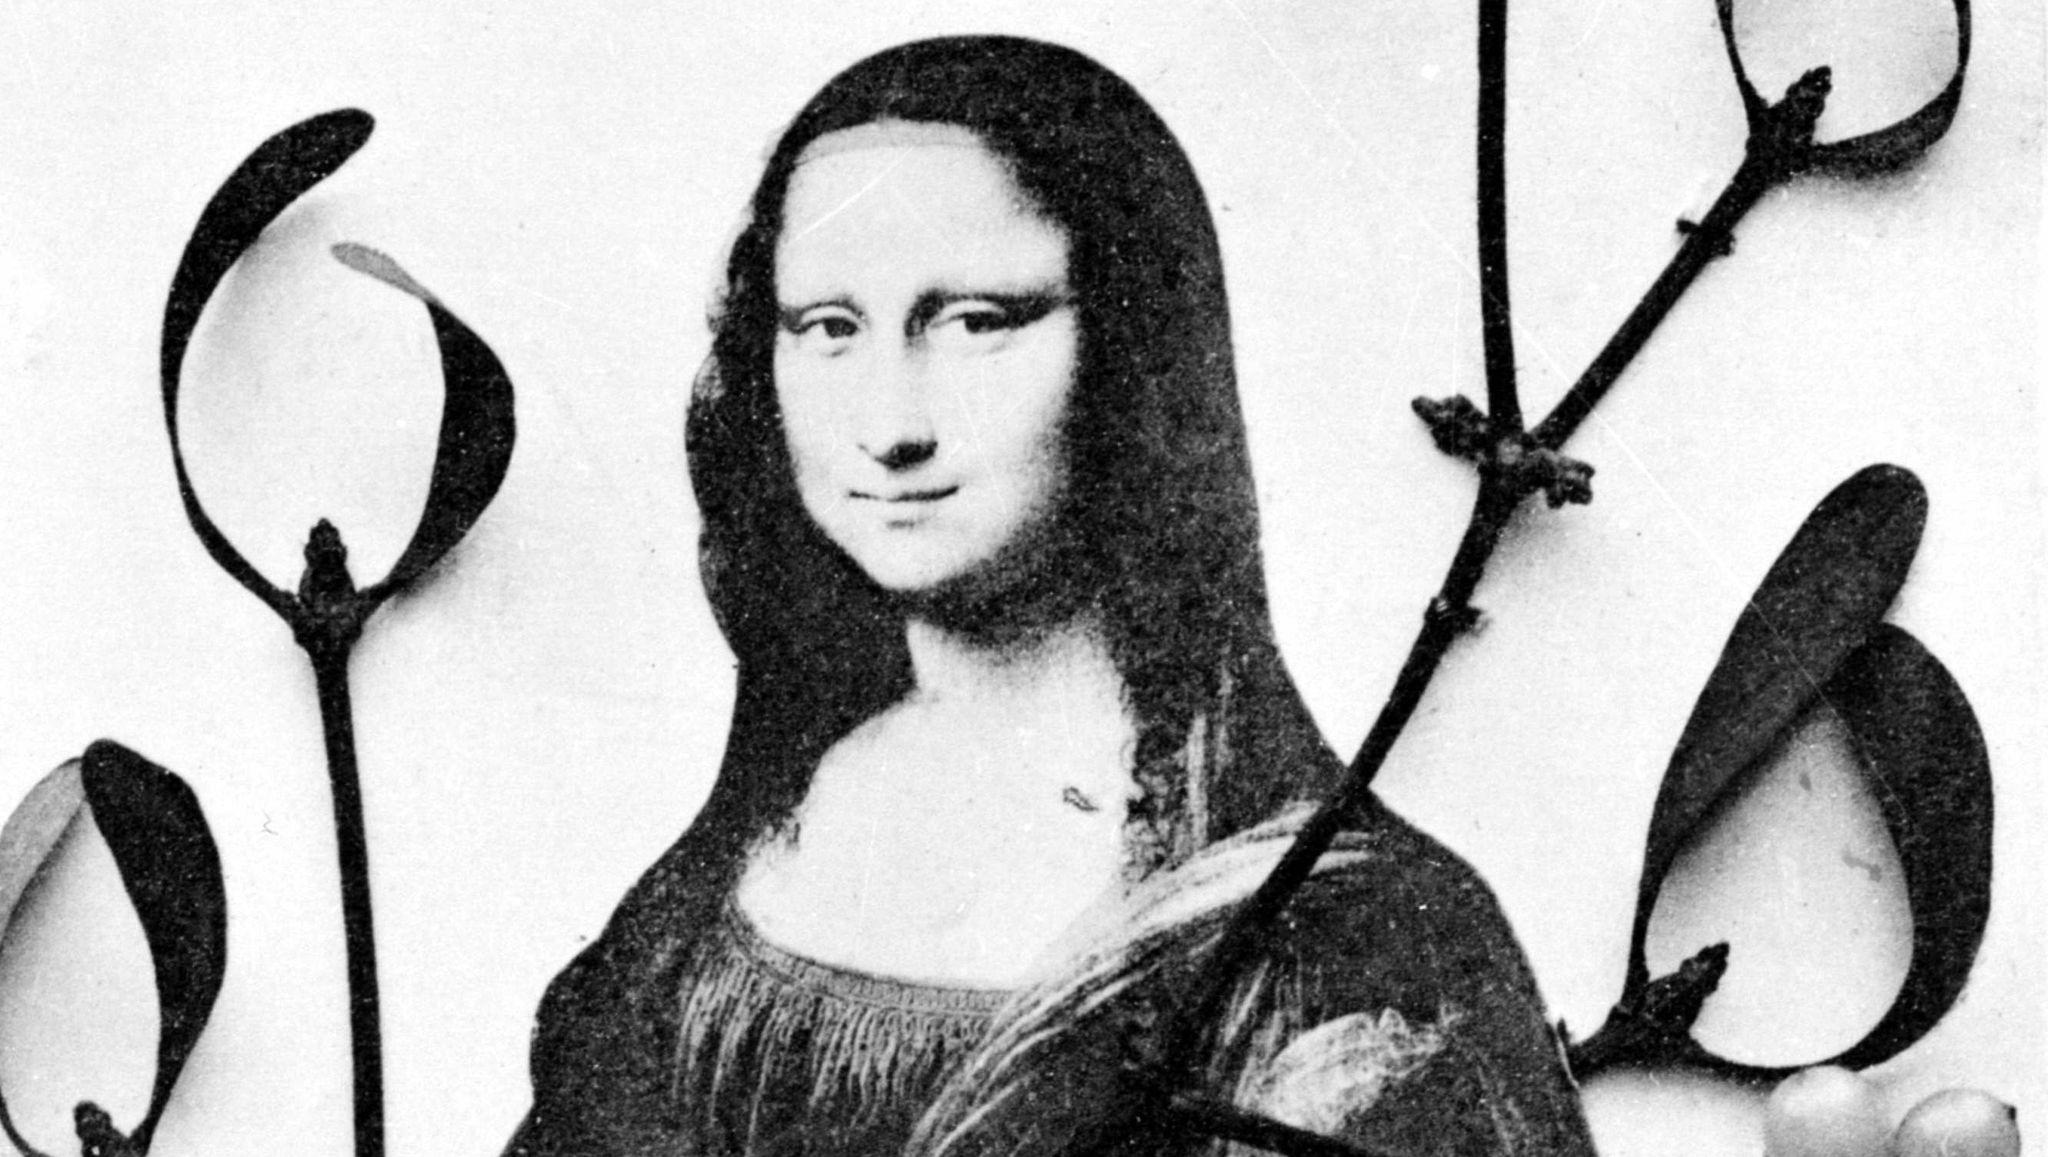 How The Theft Of The 'Mona Lisa' Shaped Fashion History